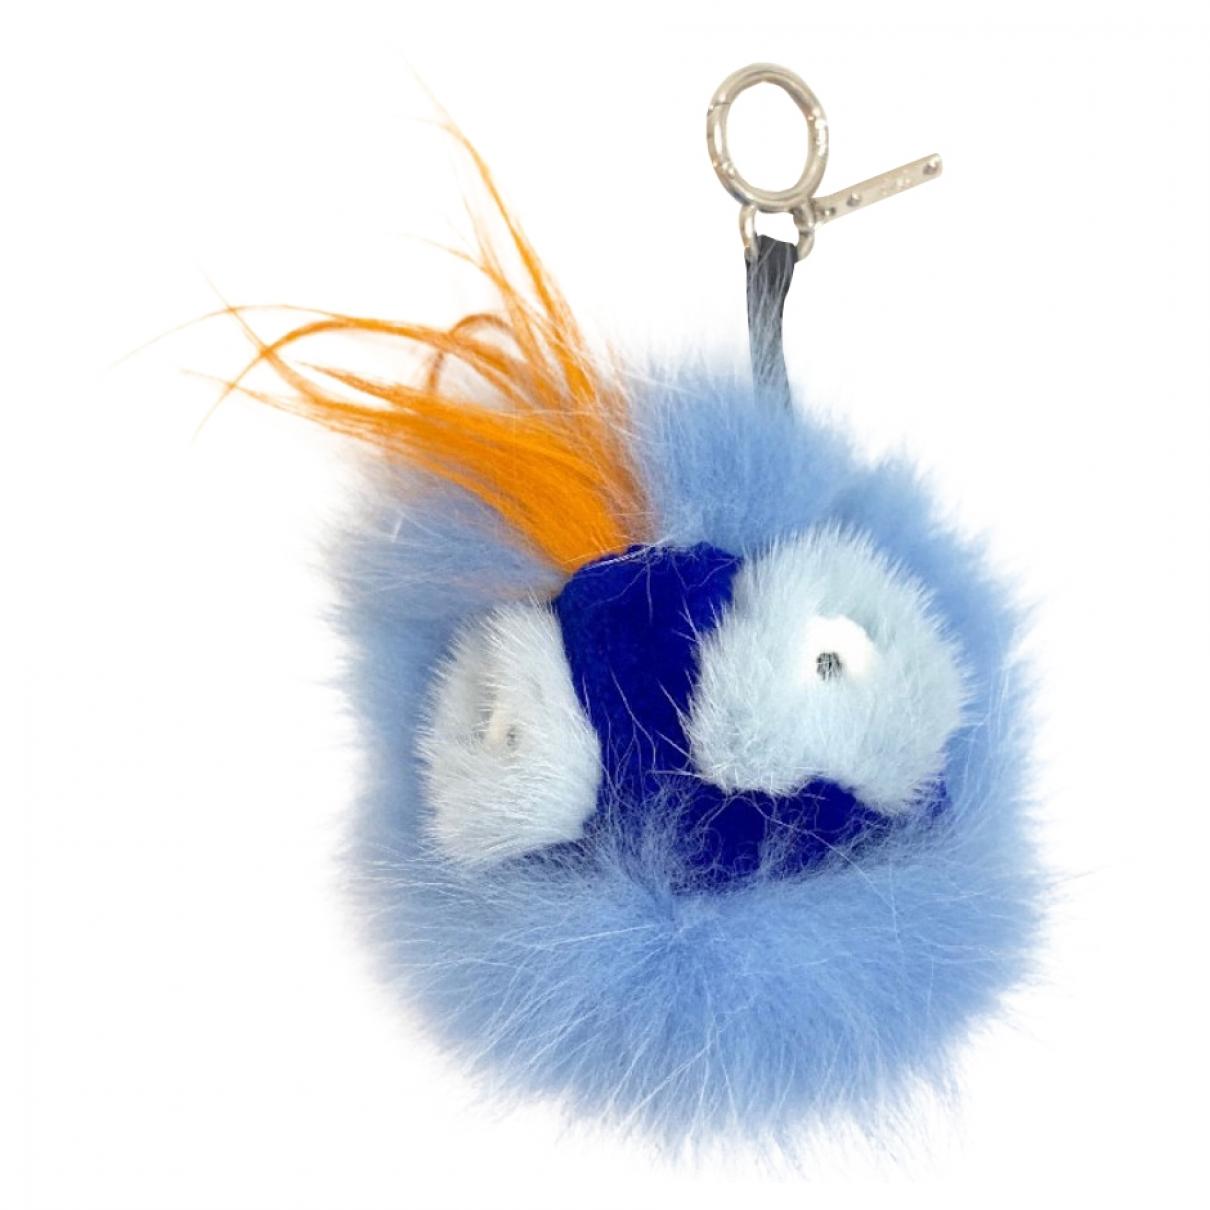 Fendi Bag Bug Taschenschmuck in  Blau Fuchs